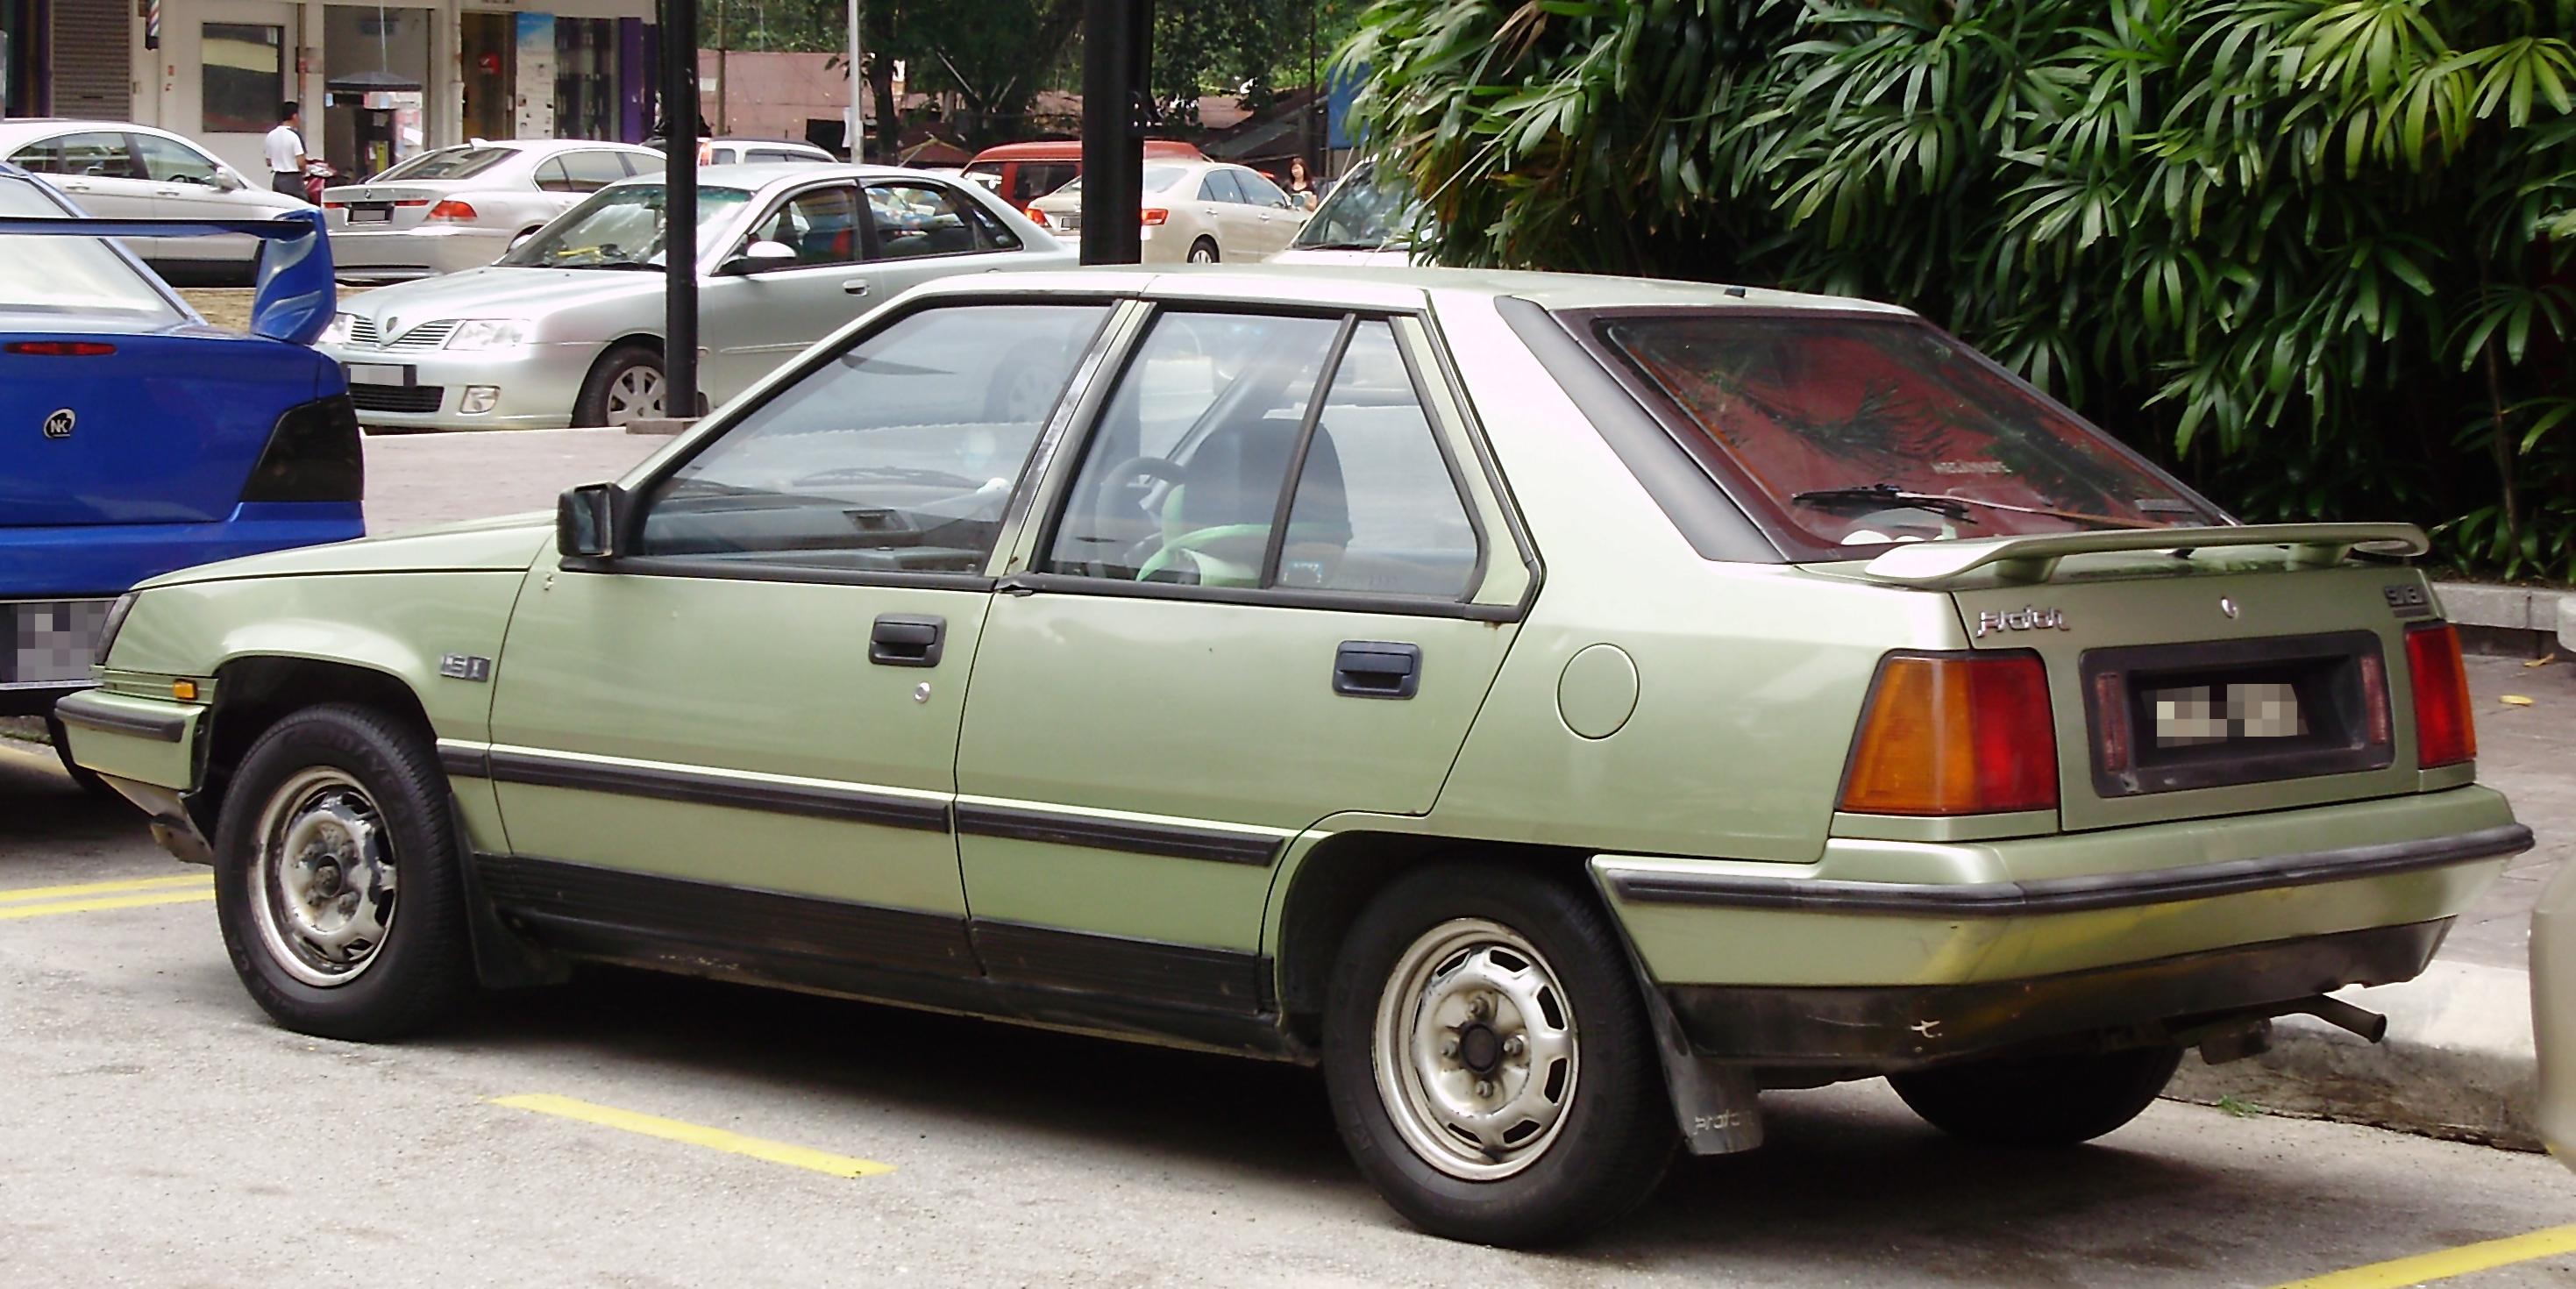 Proton Saloon Aeroback hatchback (1 generation) 1.3 MT (75 hp) Auto Fiche